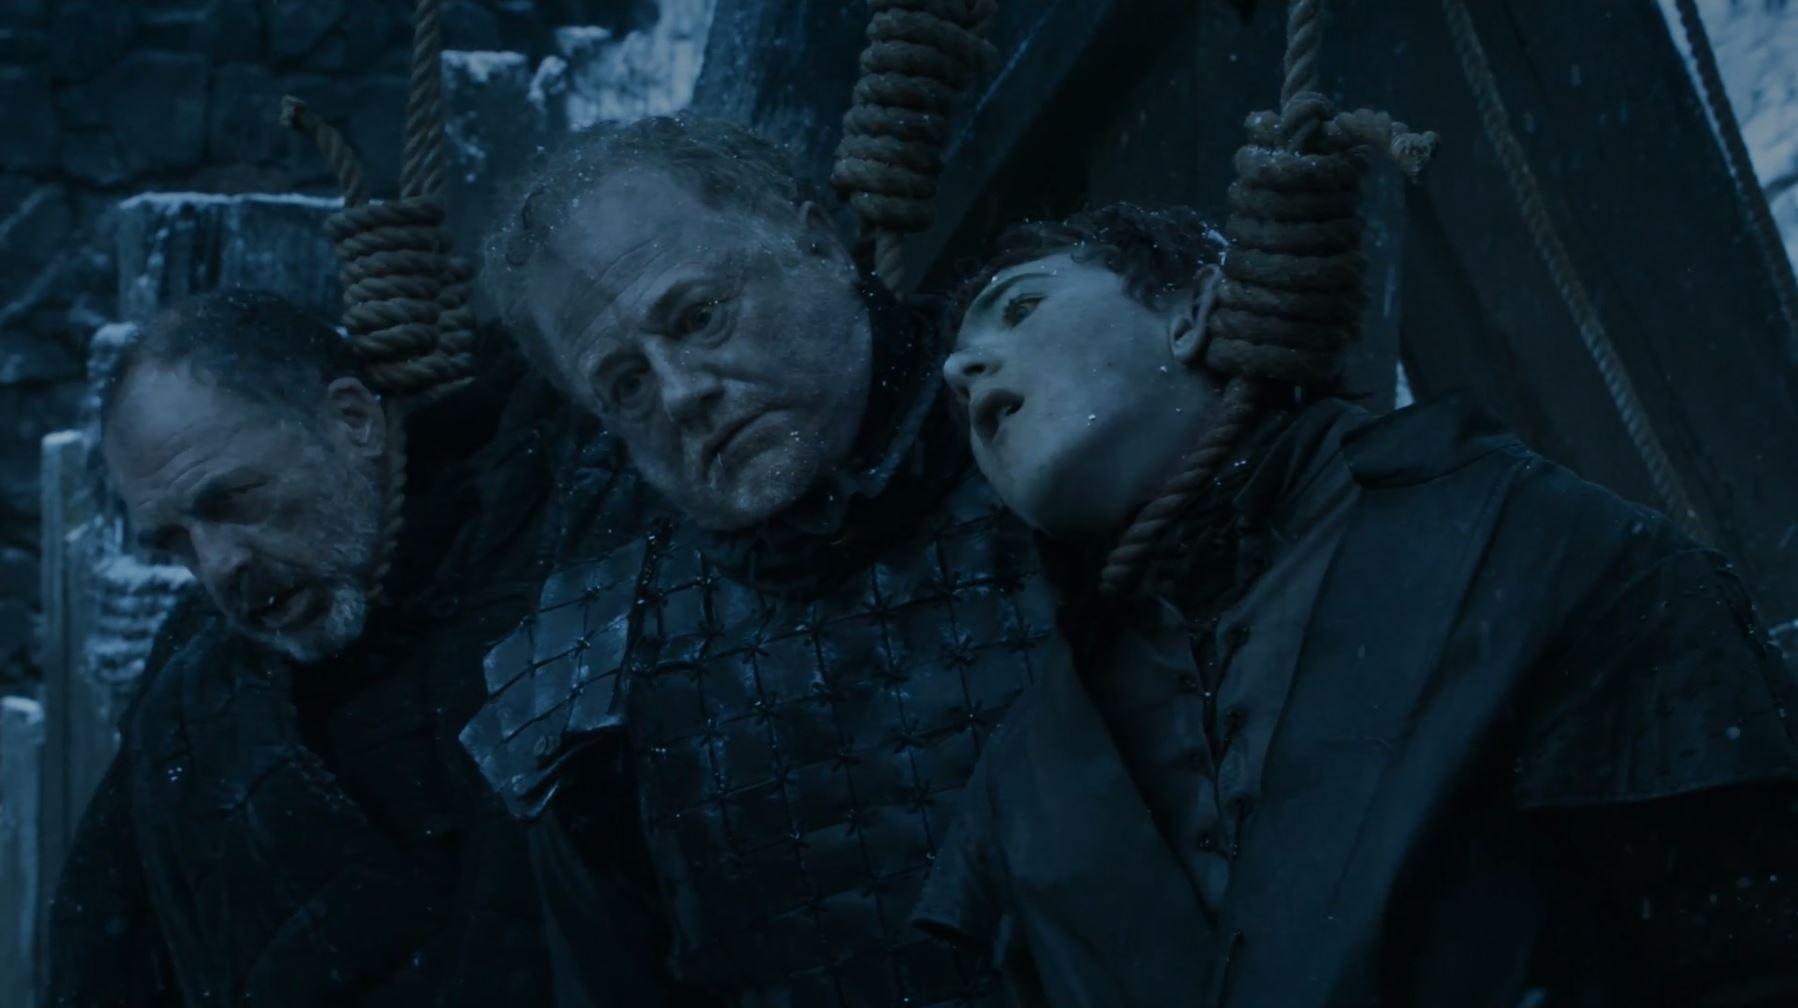 Olly and Alliser Thorne hanged dead. Game Of Thrones S6Ep3 Oathbreaker Review